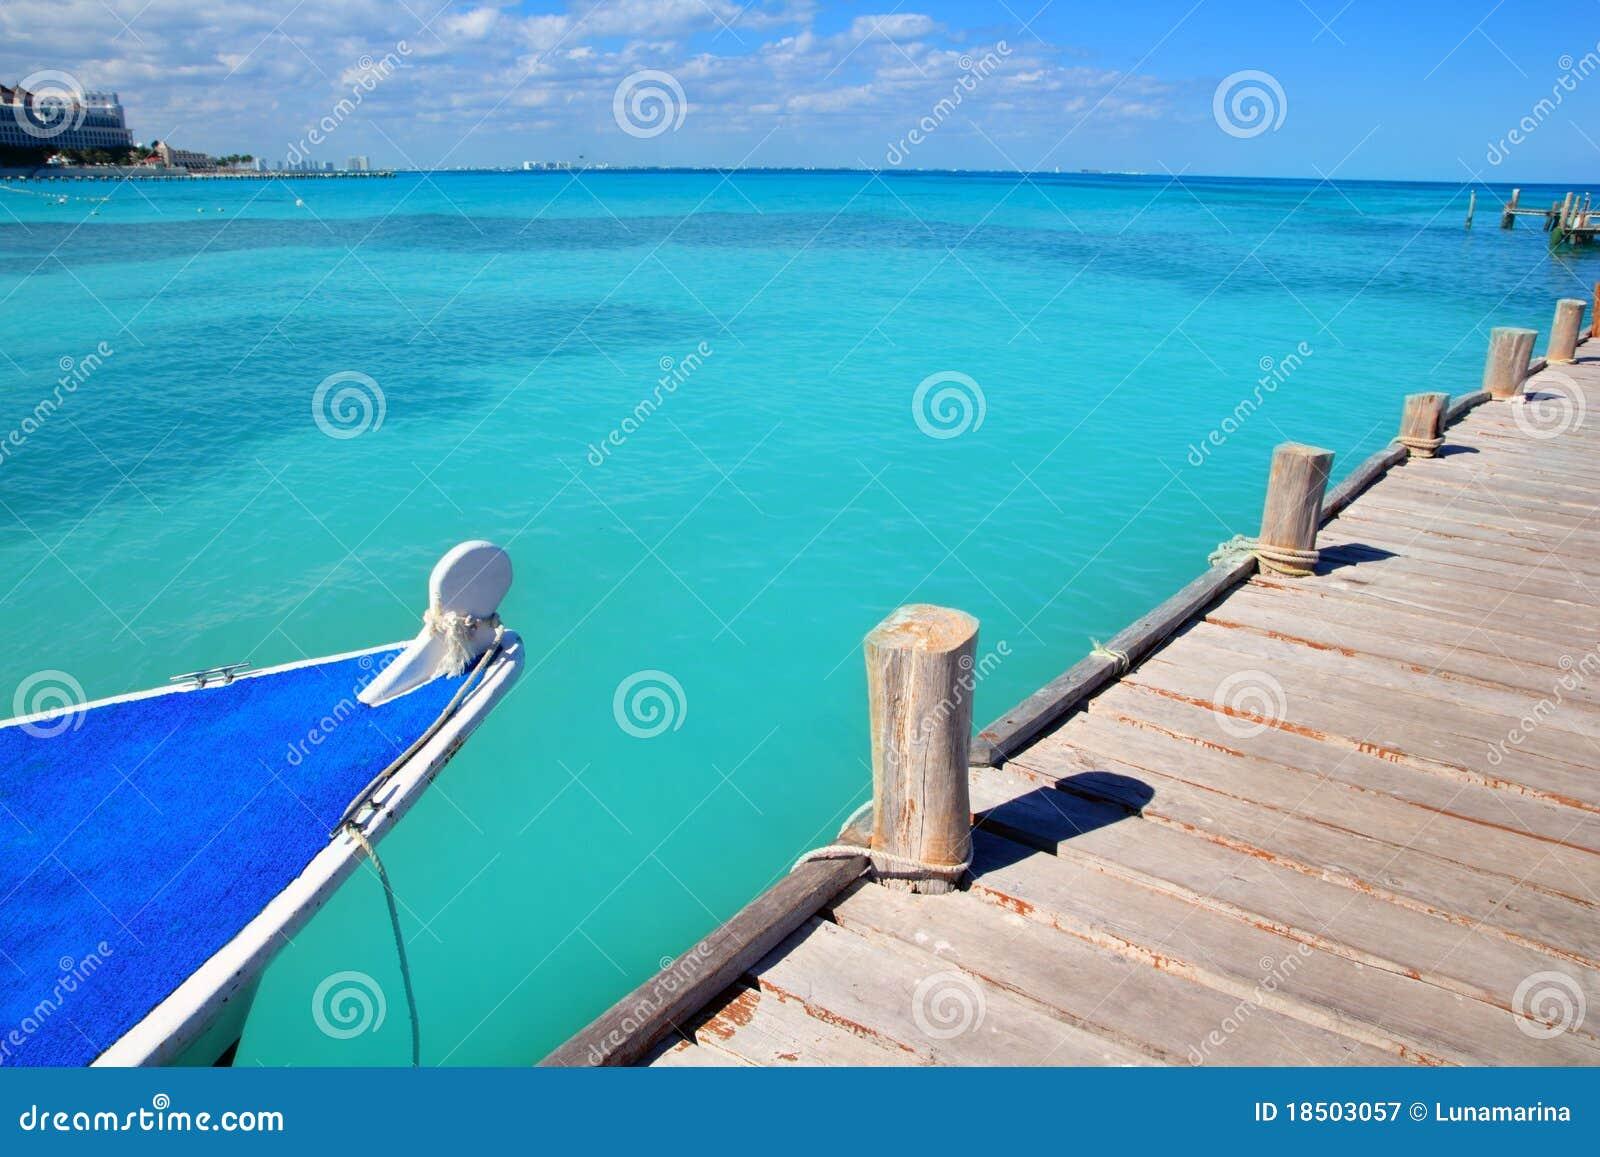 моря пристани cancun шлюпки древесина карибского тропическая